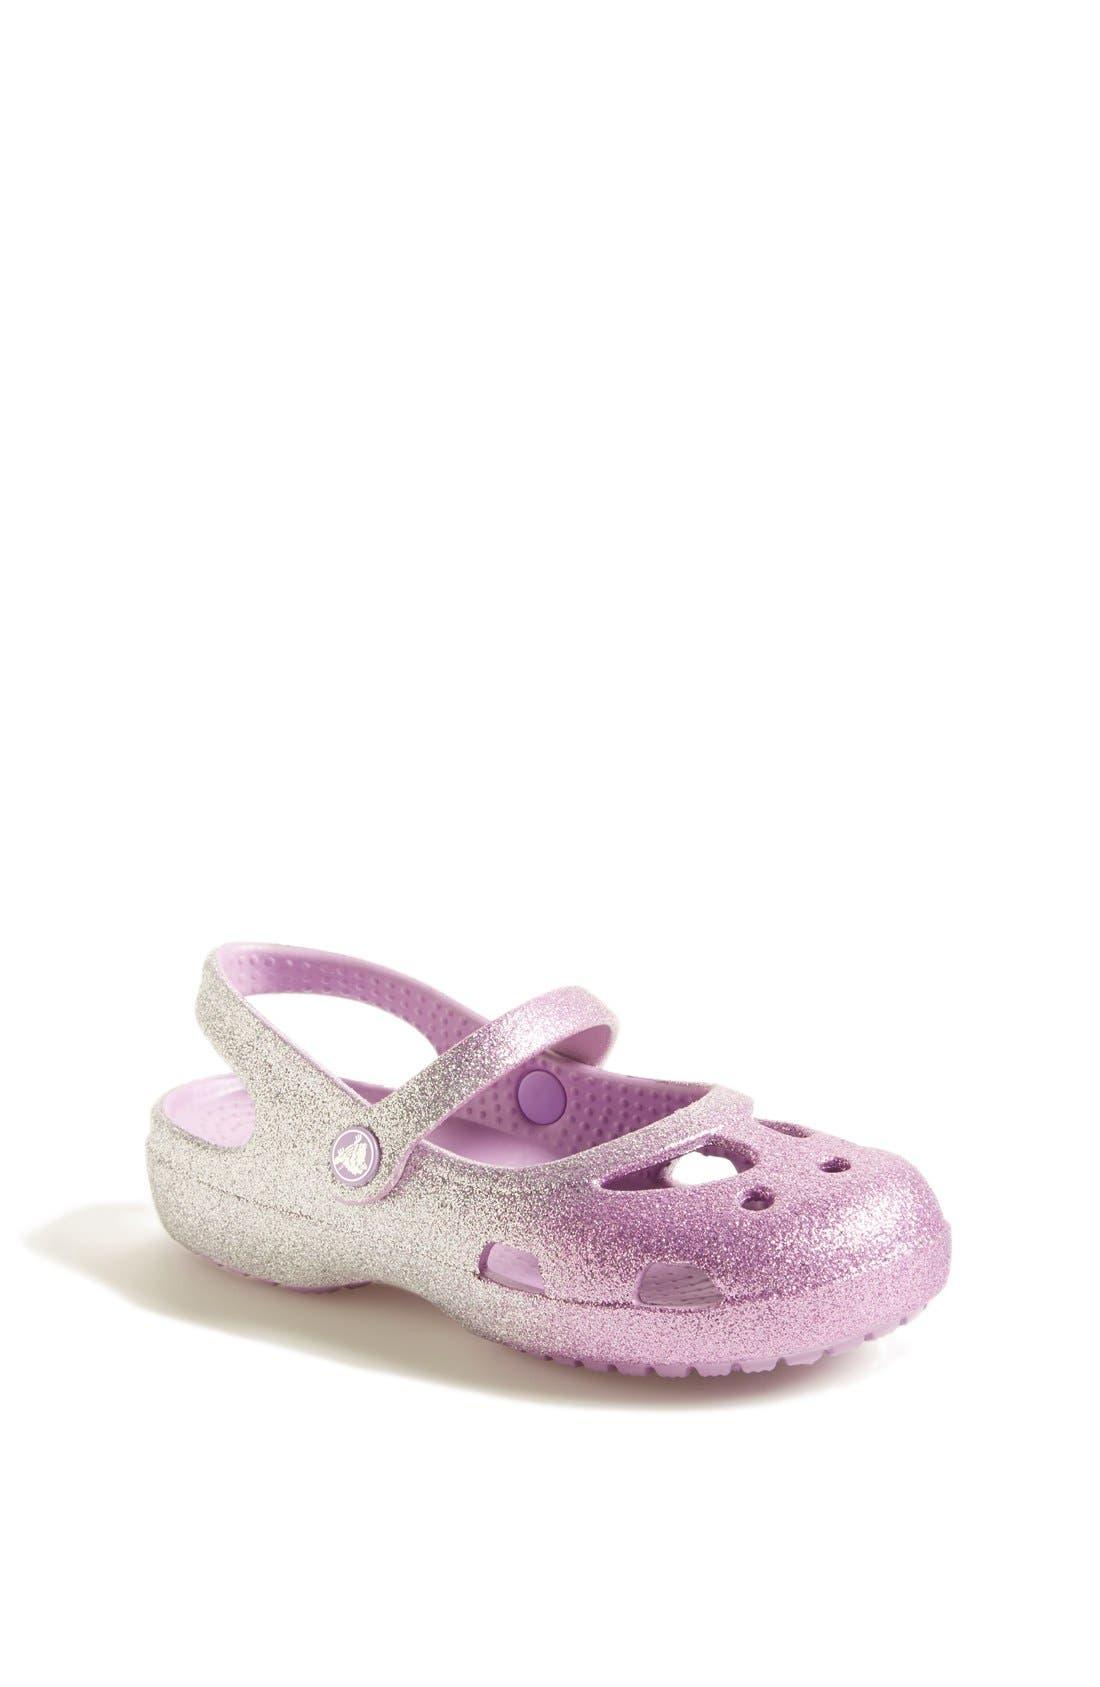 Alternate Image 1 Selected - CROCS™ 'Shayna' Sandal (Baby, Walker, Toddler & Little Kid)